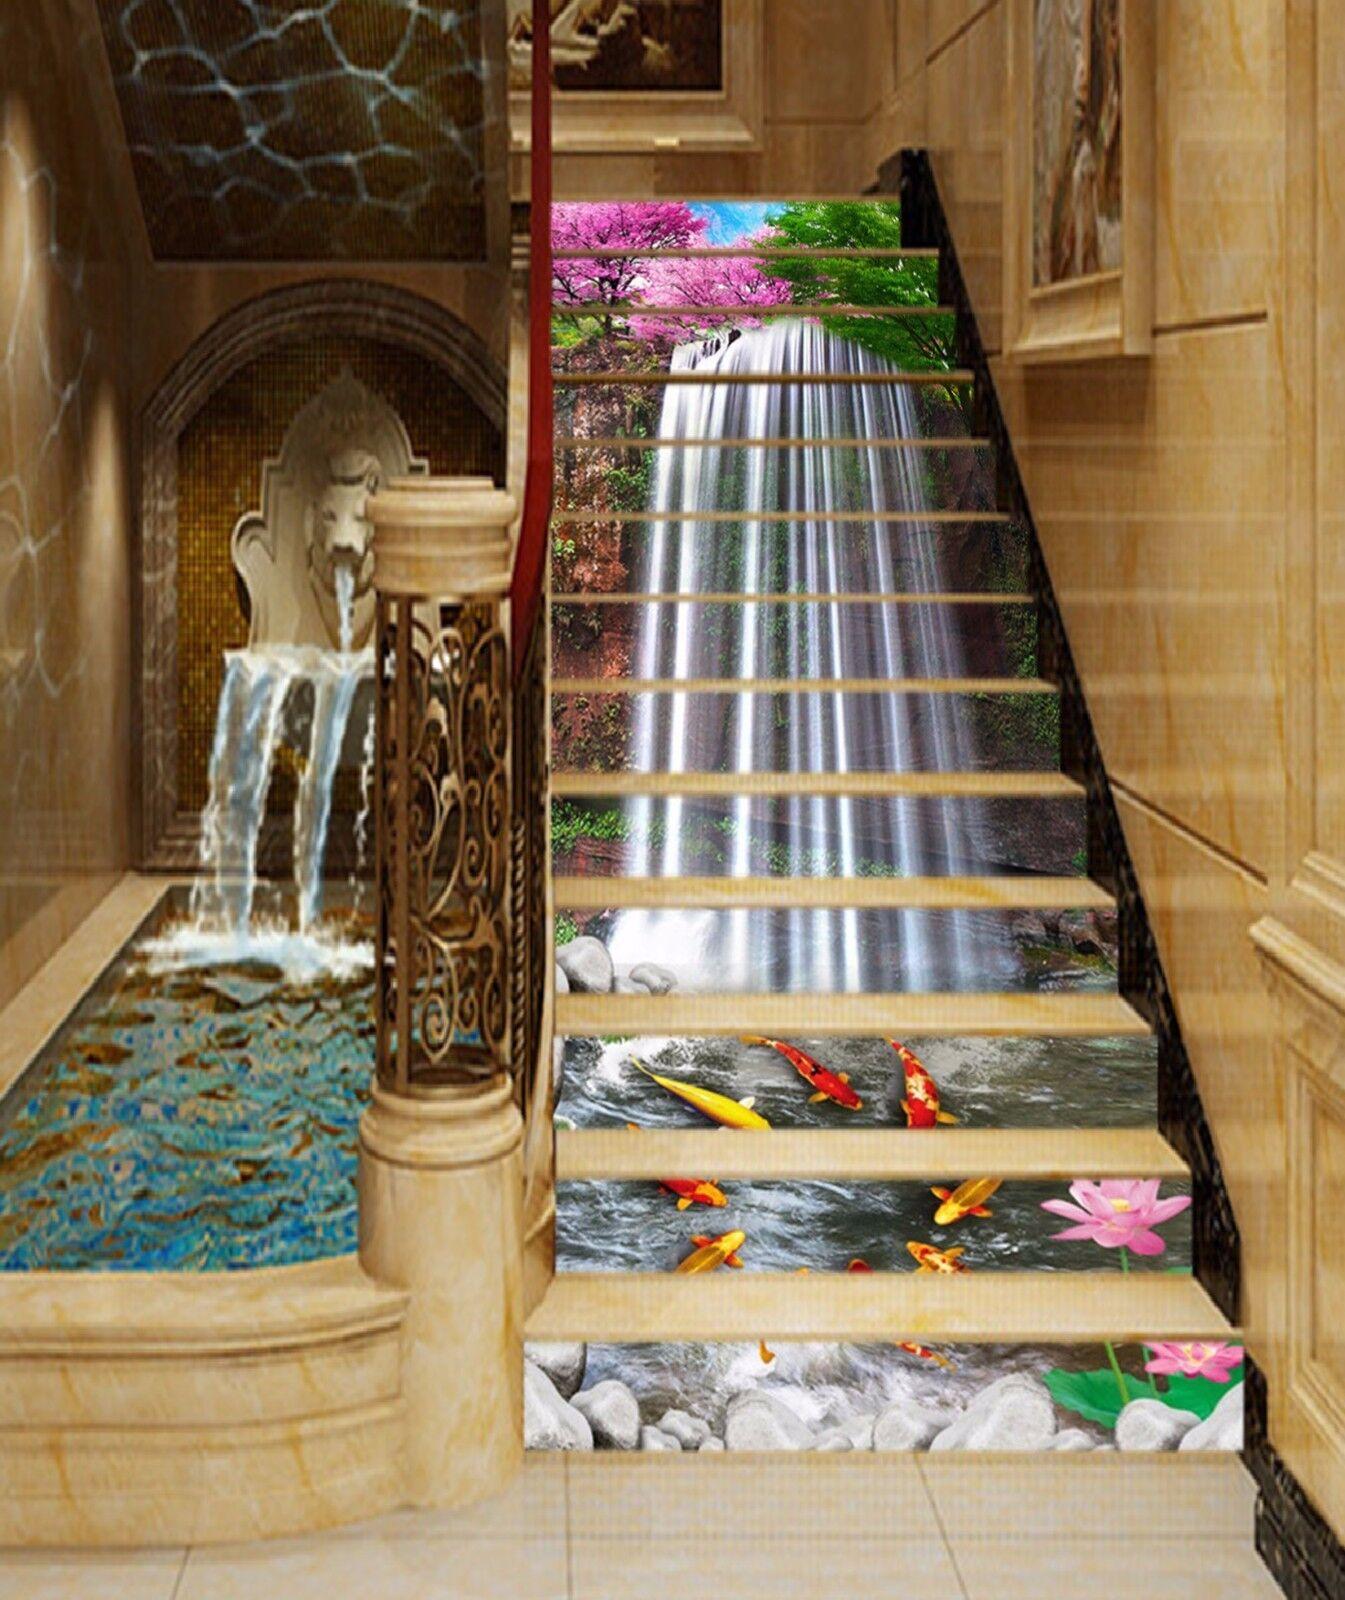 3D Carp Waterfall 77Stair Risers Decoration Photo Mural Vinyl Decal WandPapier AU